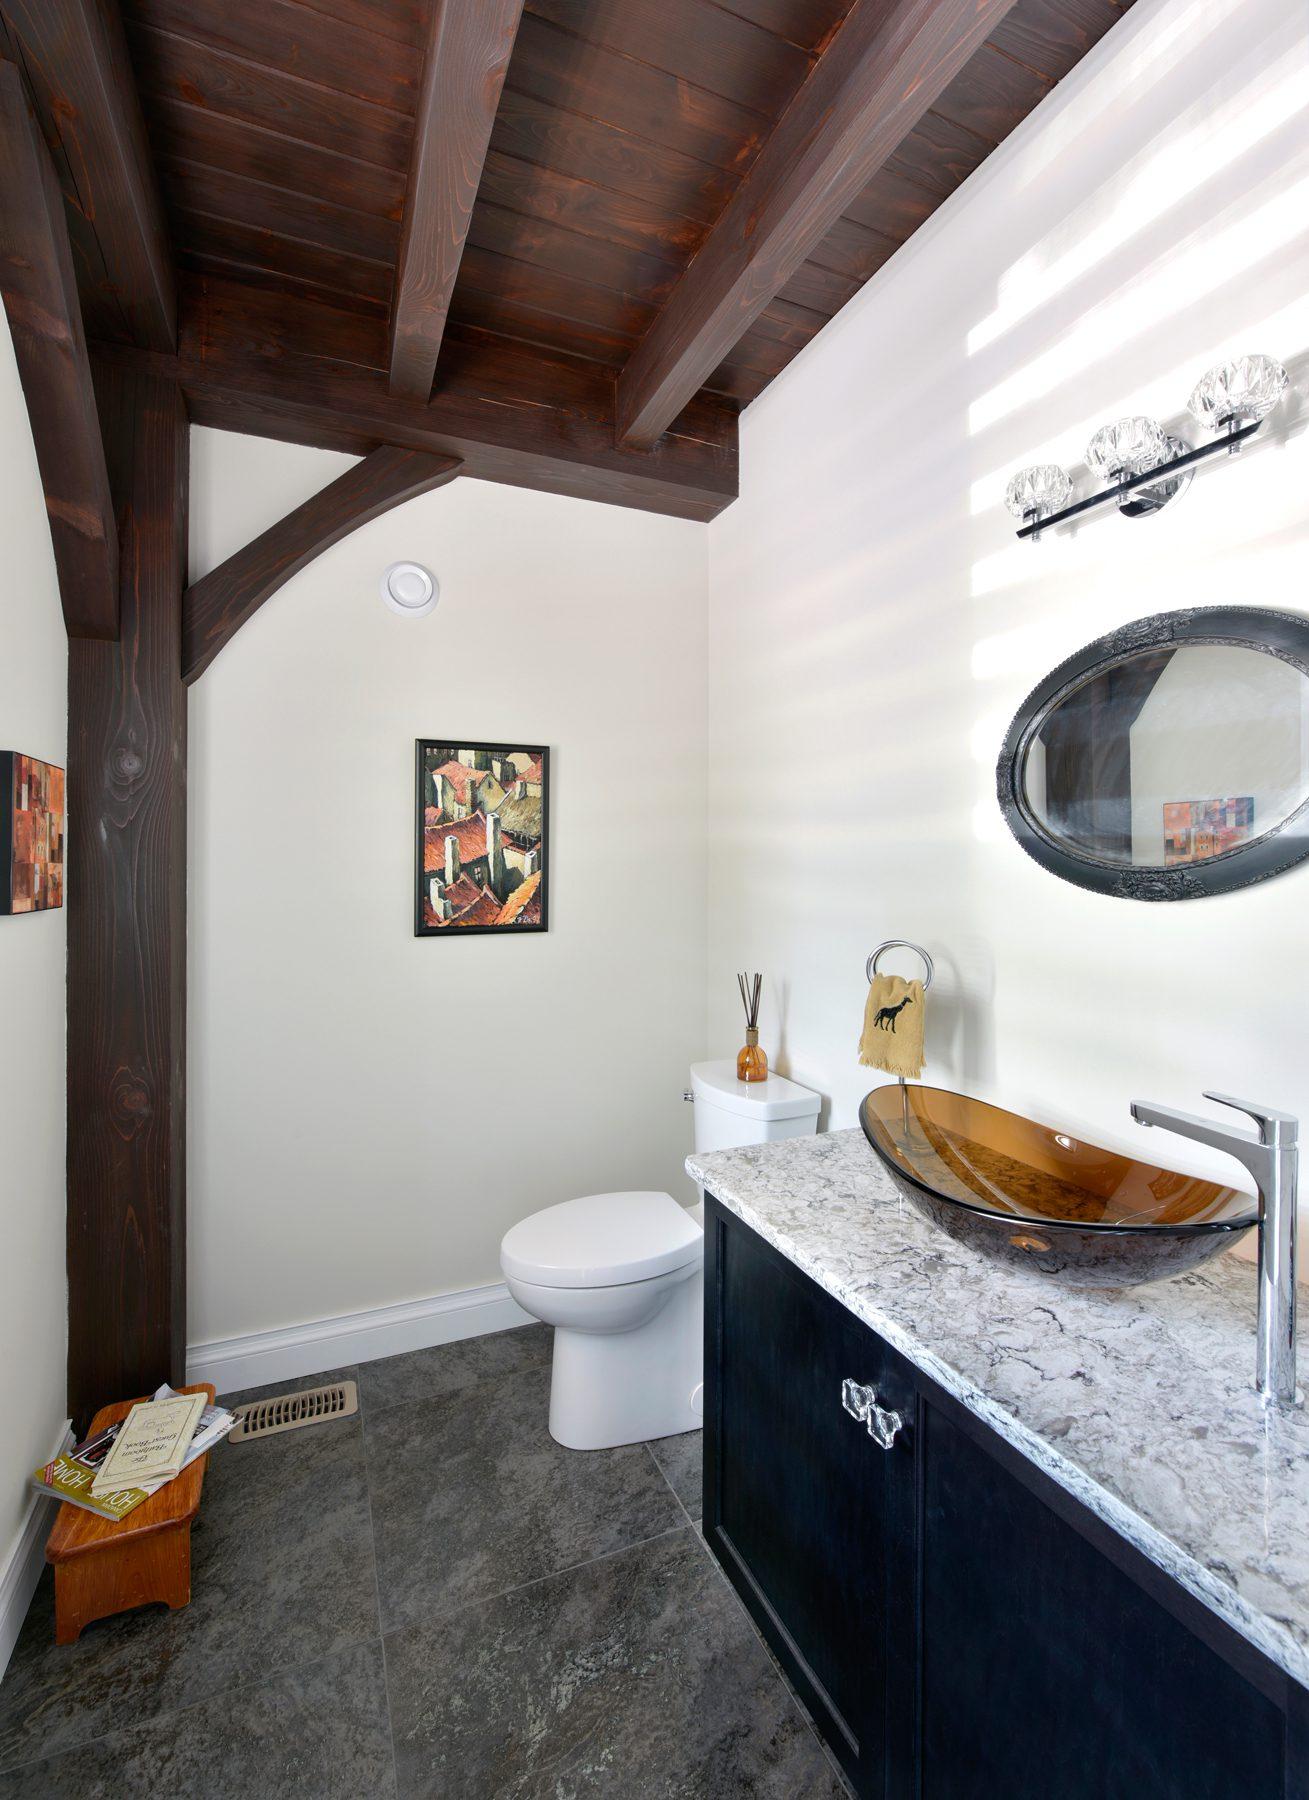 Normerica Timber Frame, Interior, Cottage, Bathroom, Powder Room